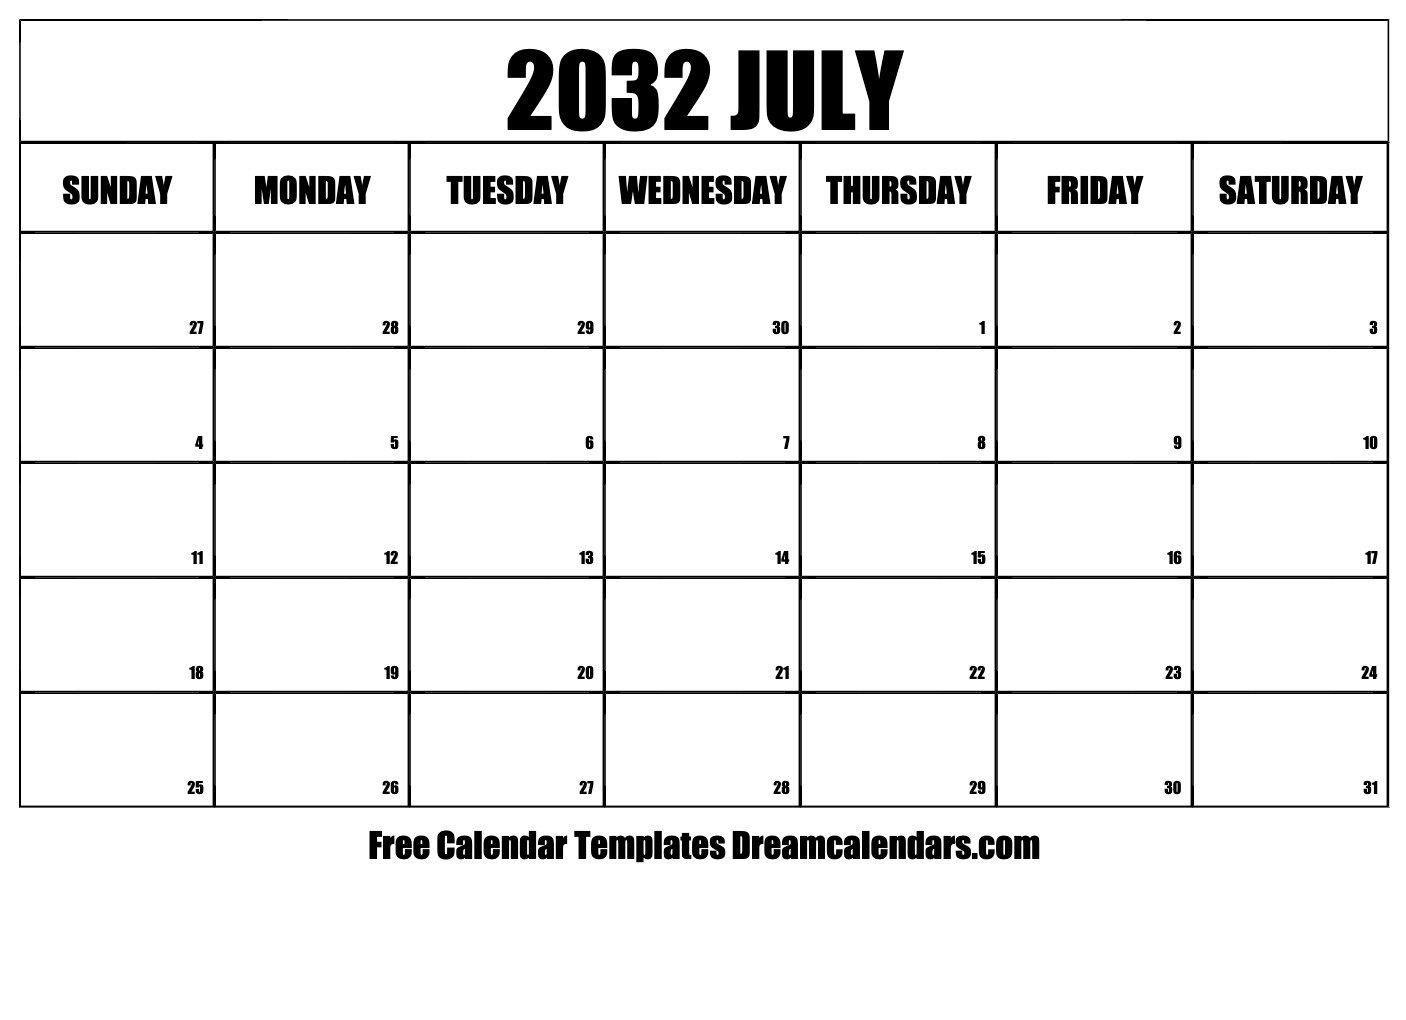 July 2032 Calendar   Free Blank Printable Templates Free Bold Printable Calnder Jully